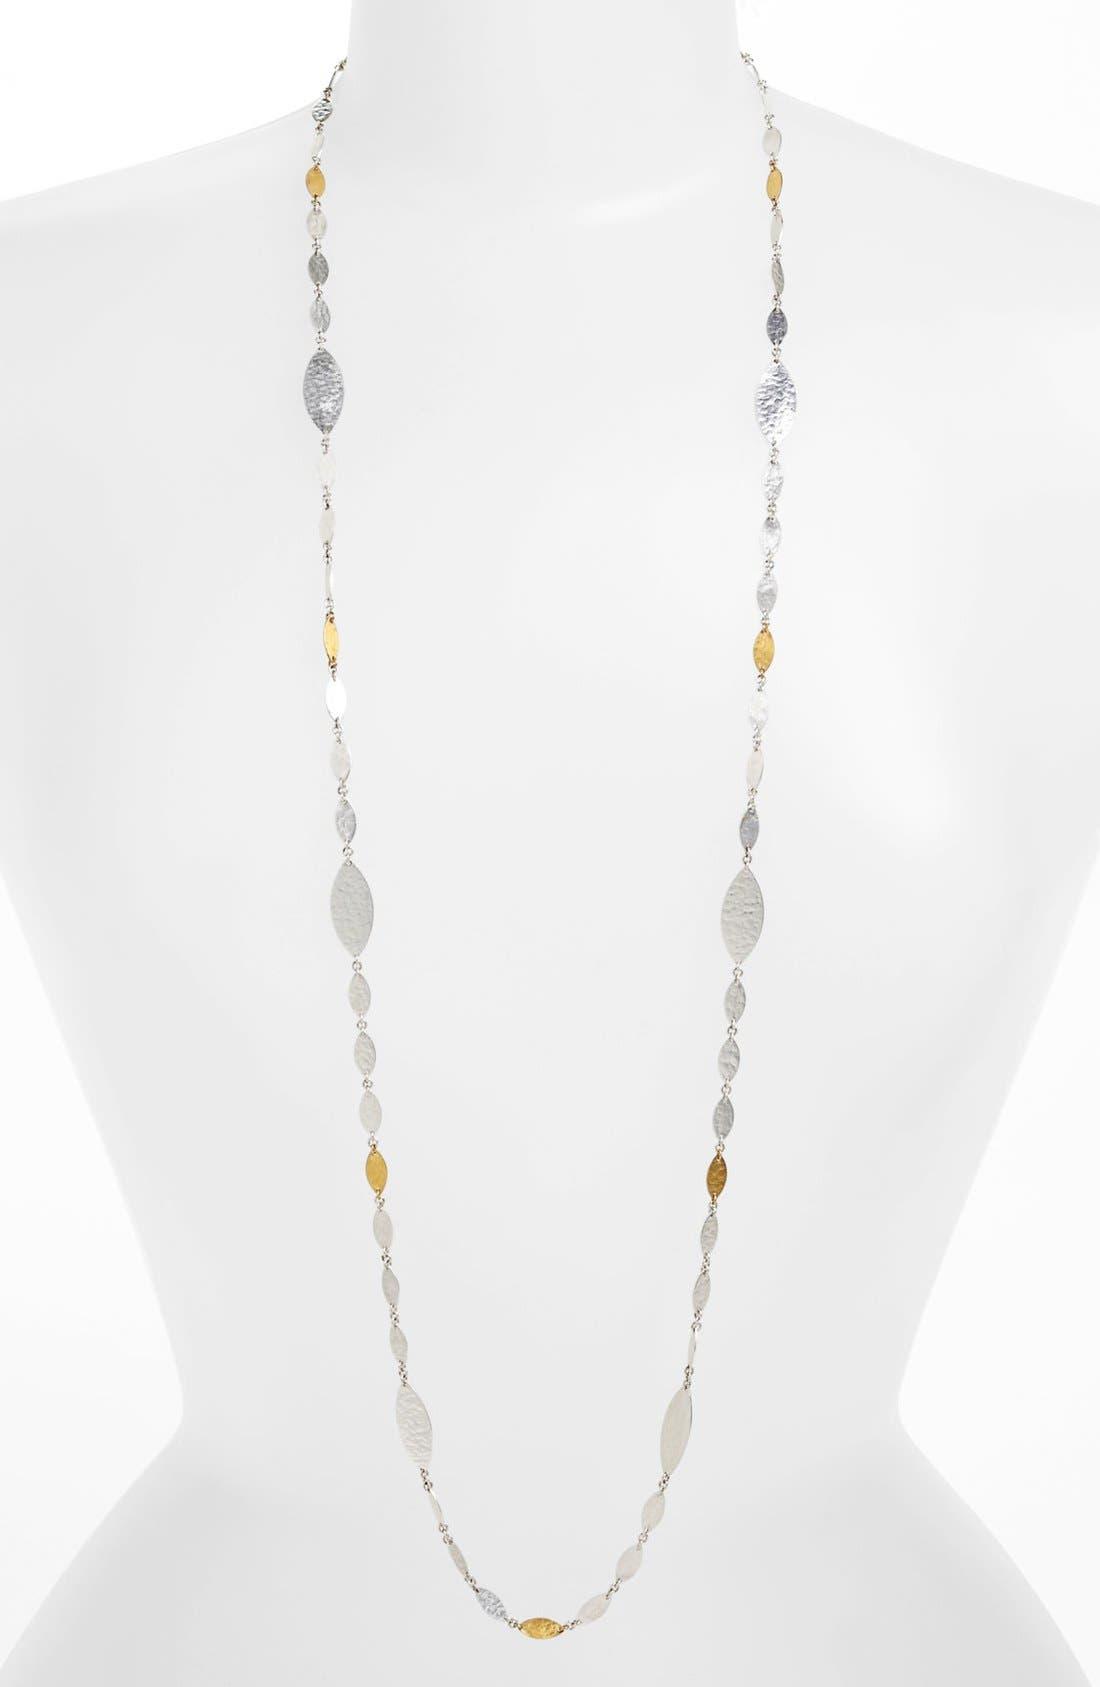 Main Image - Gurhan 'Willow' Long Leaf Station Necklace